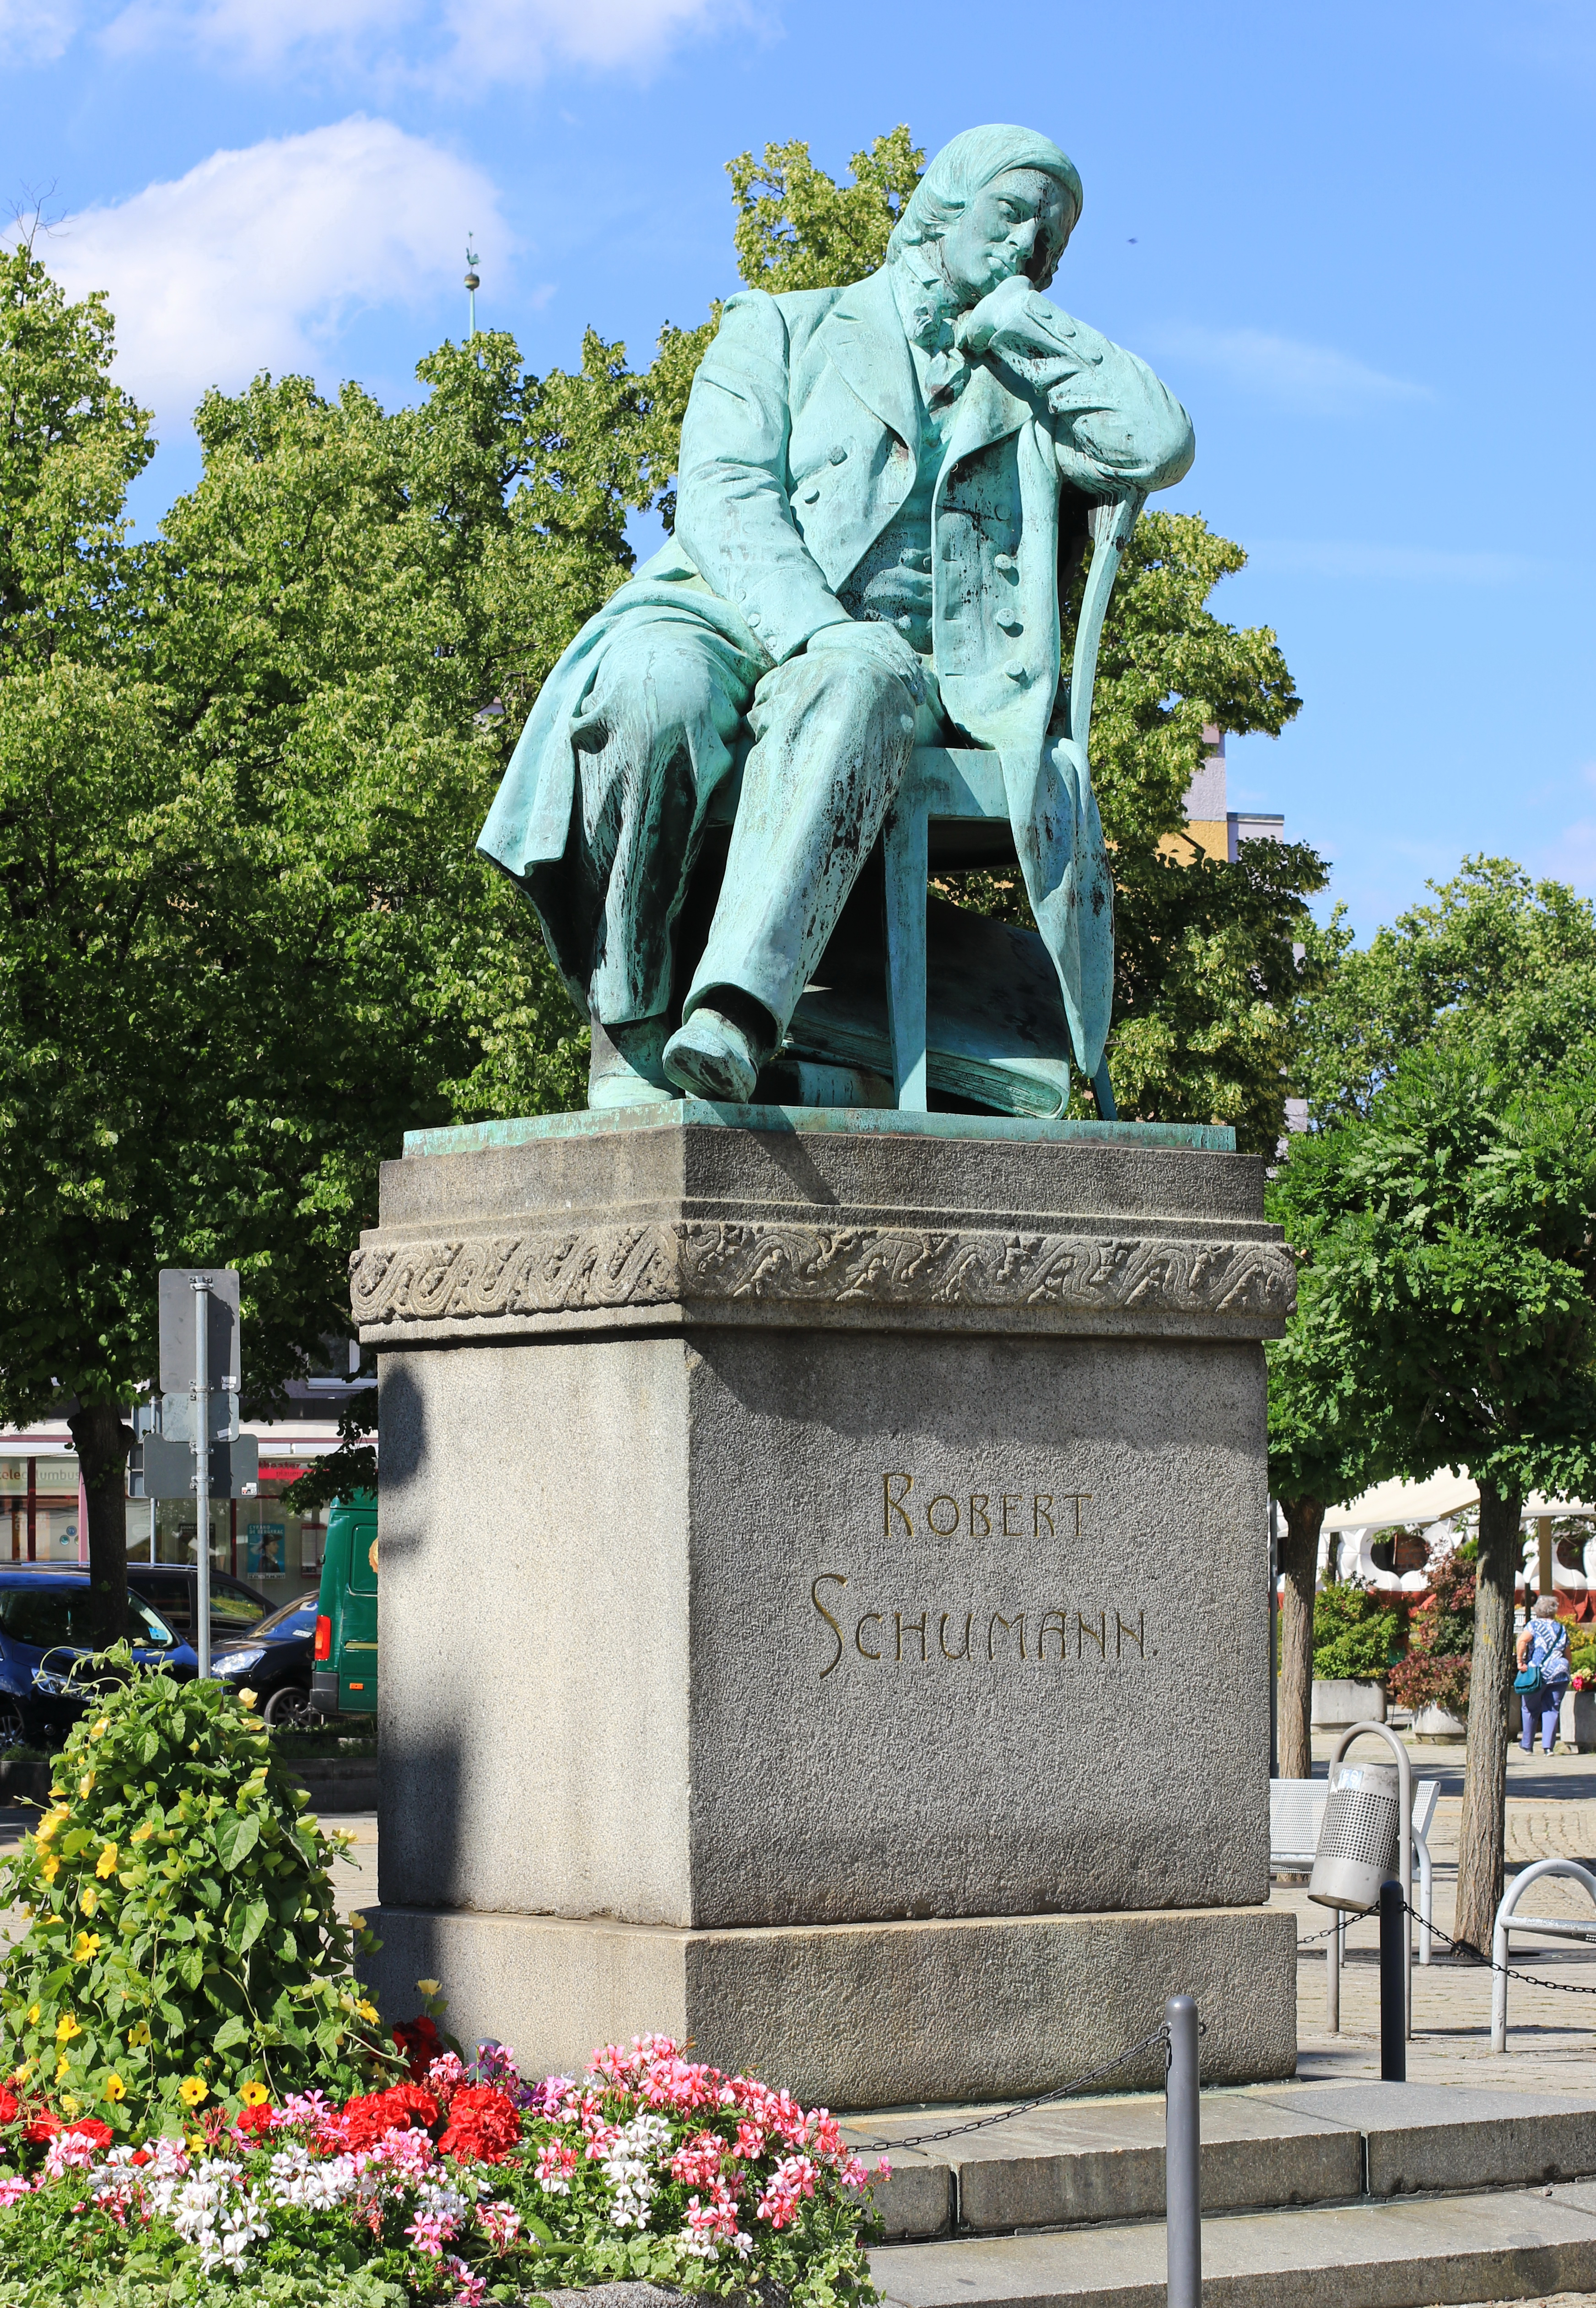 Monumento de Robert Schumann en Zwickau, Sajonia.